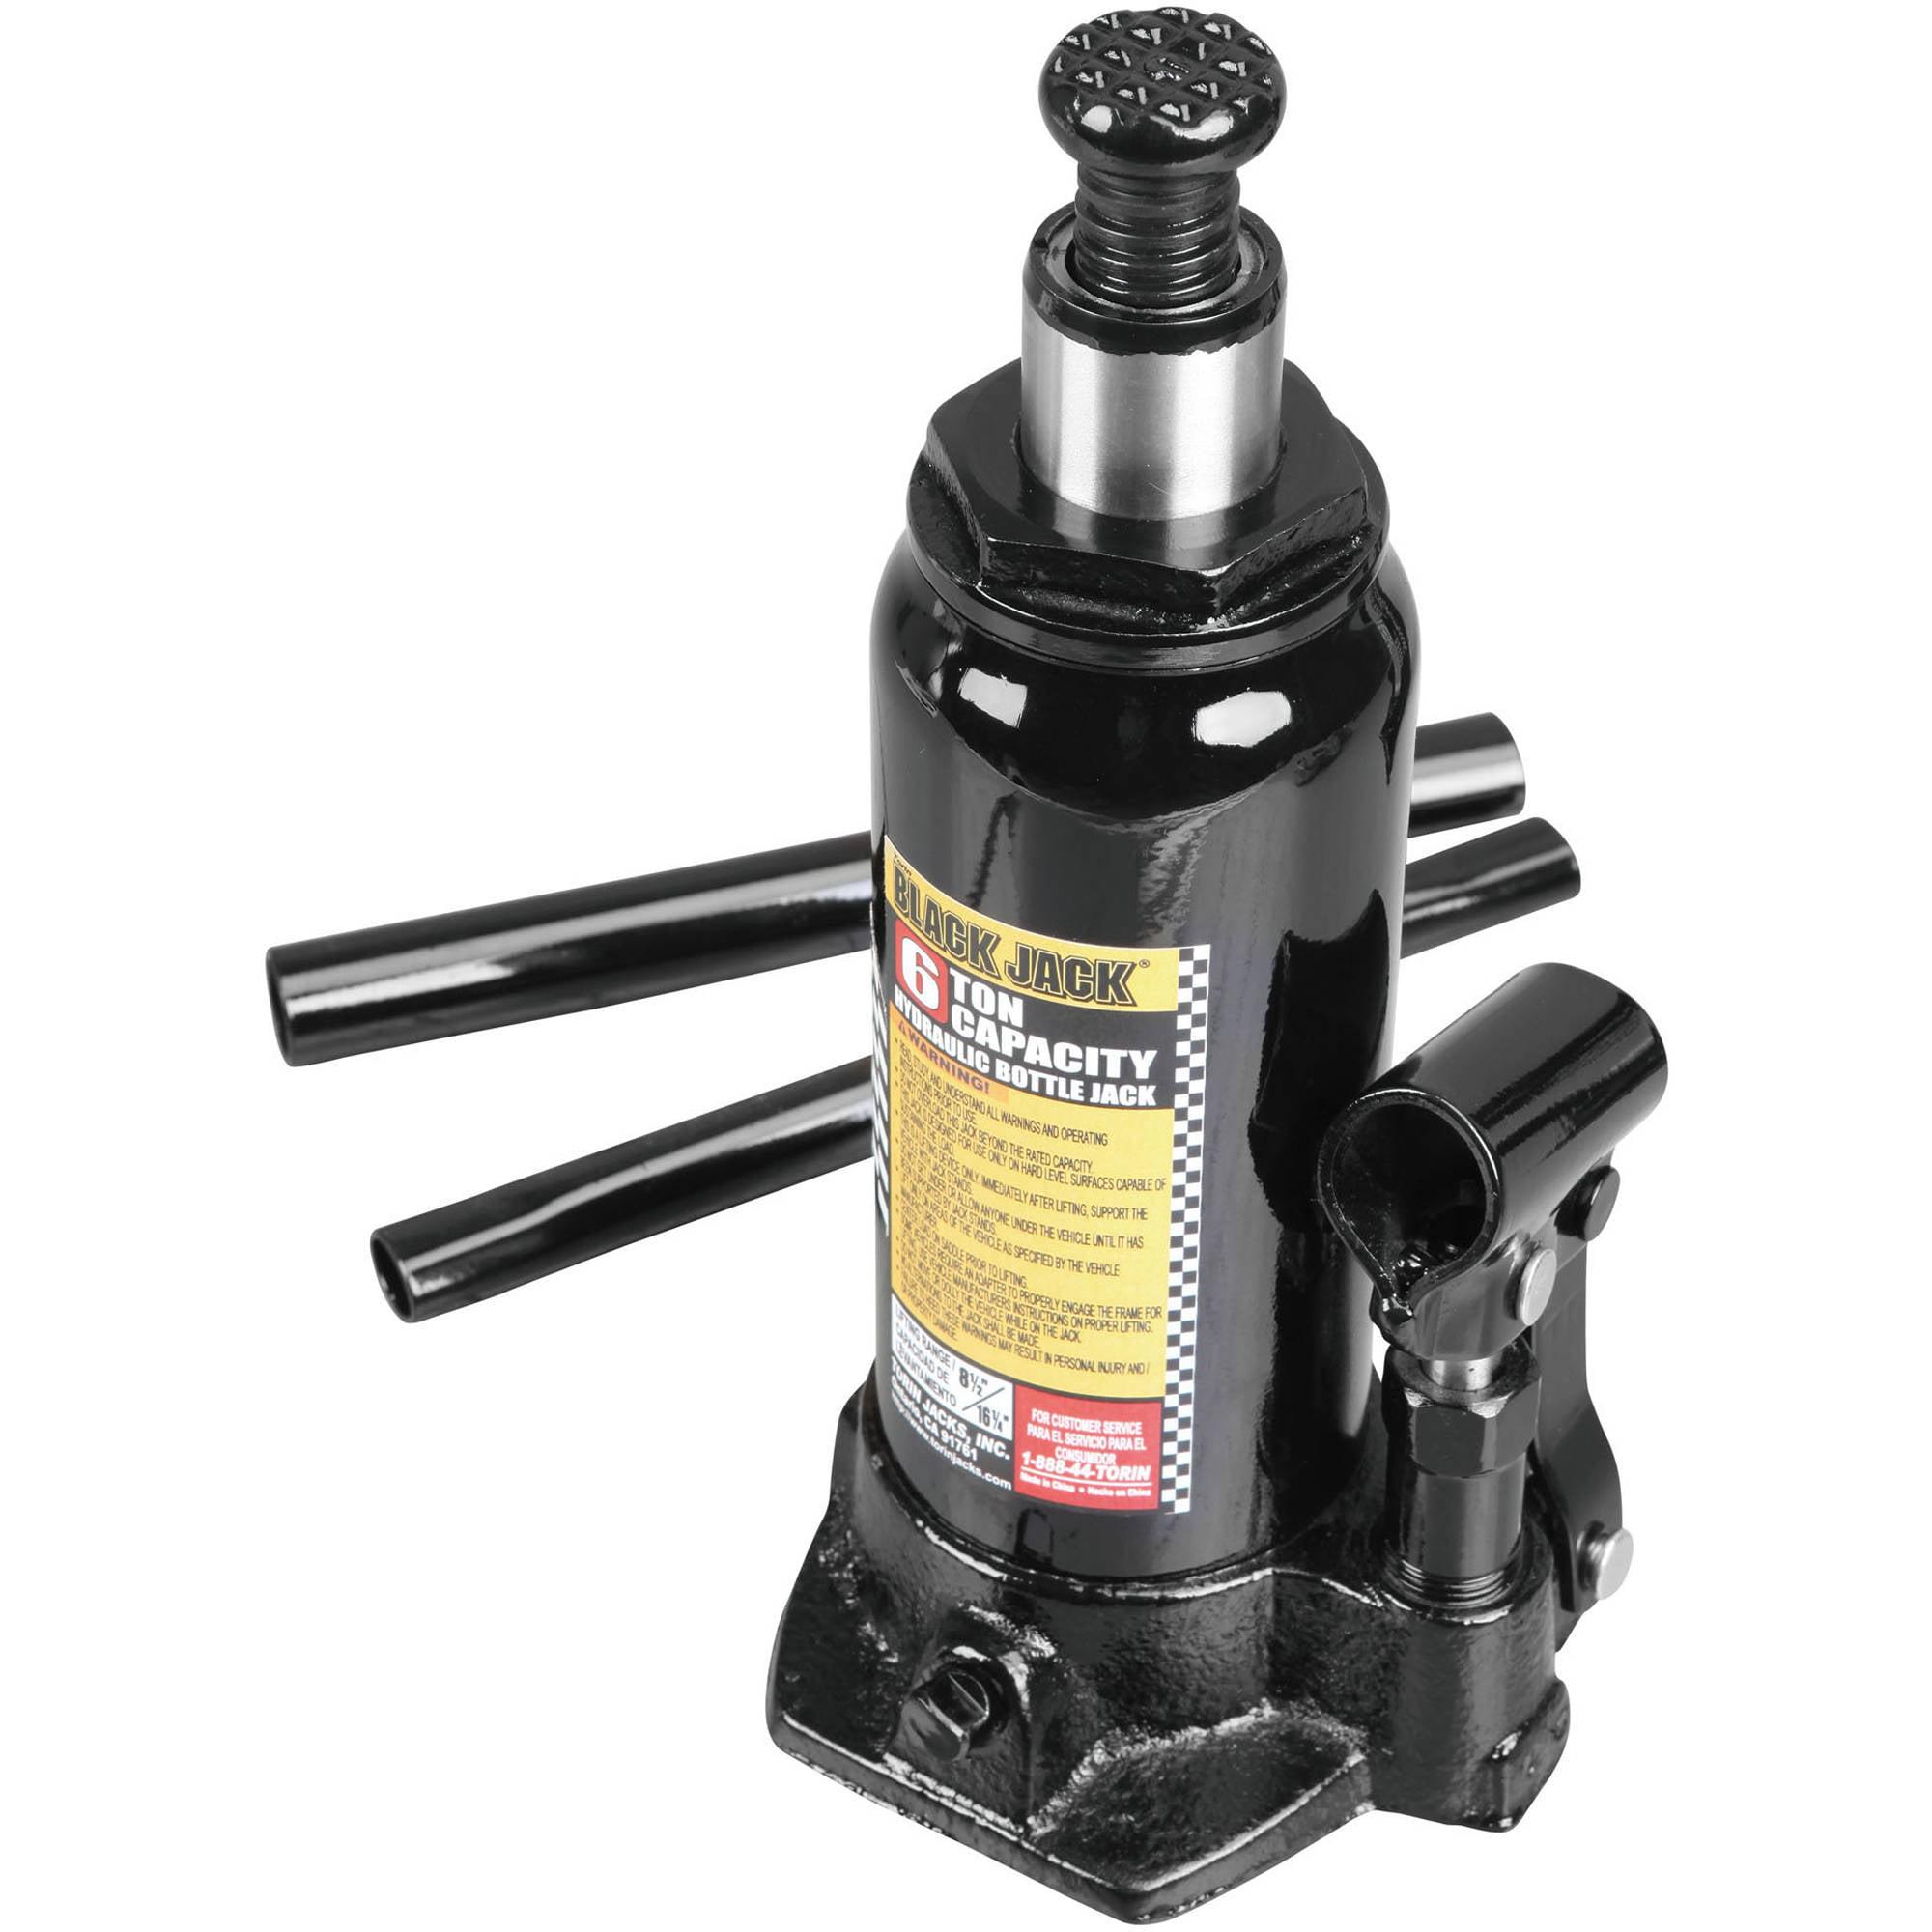 4 Ton Torin Jack Parts Diagram Best Secret Wiring Bottle Images Gallery